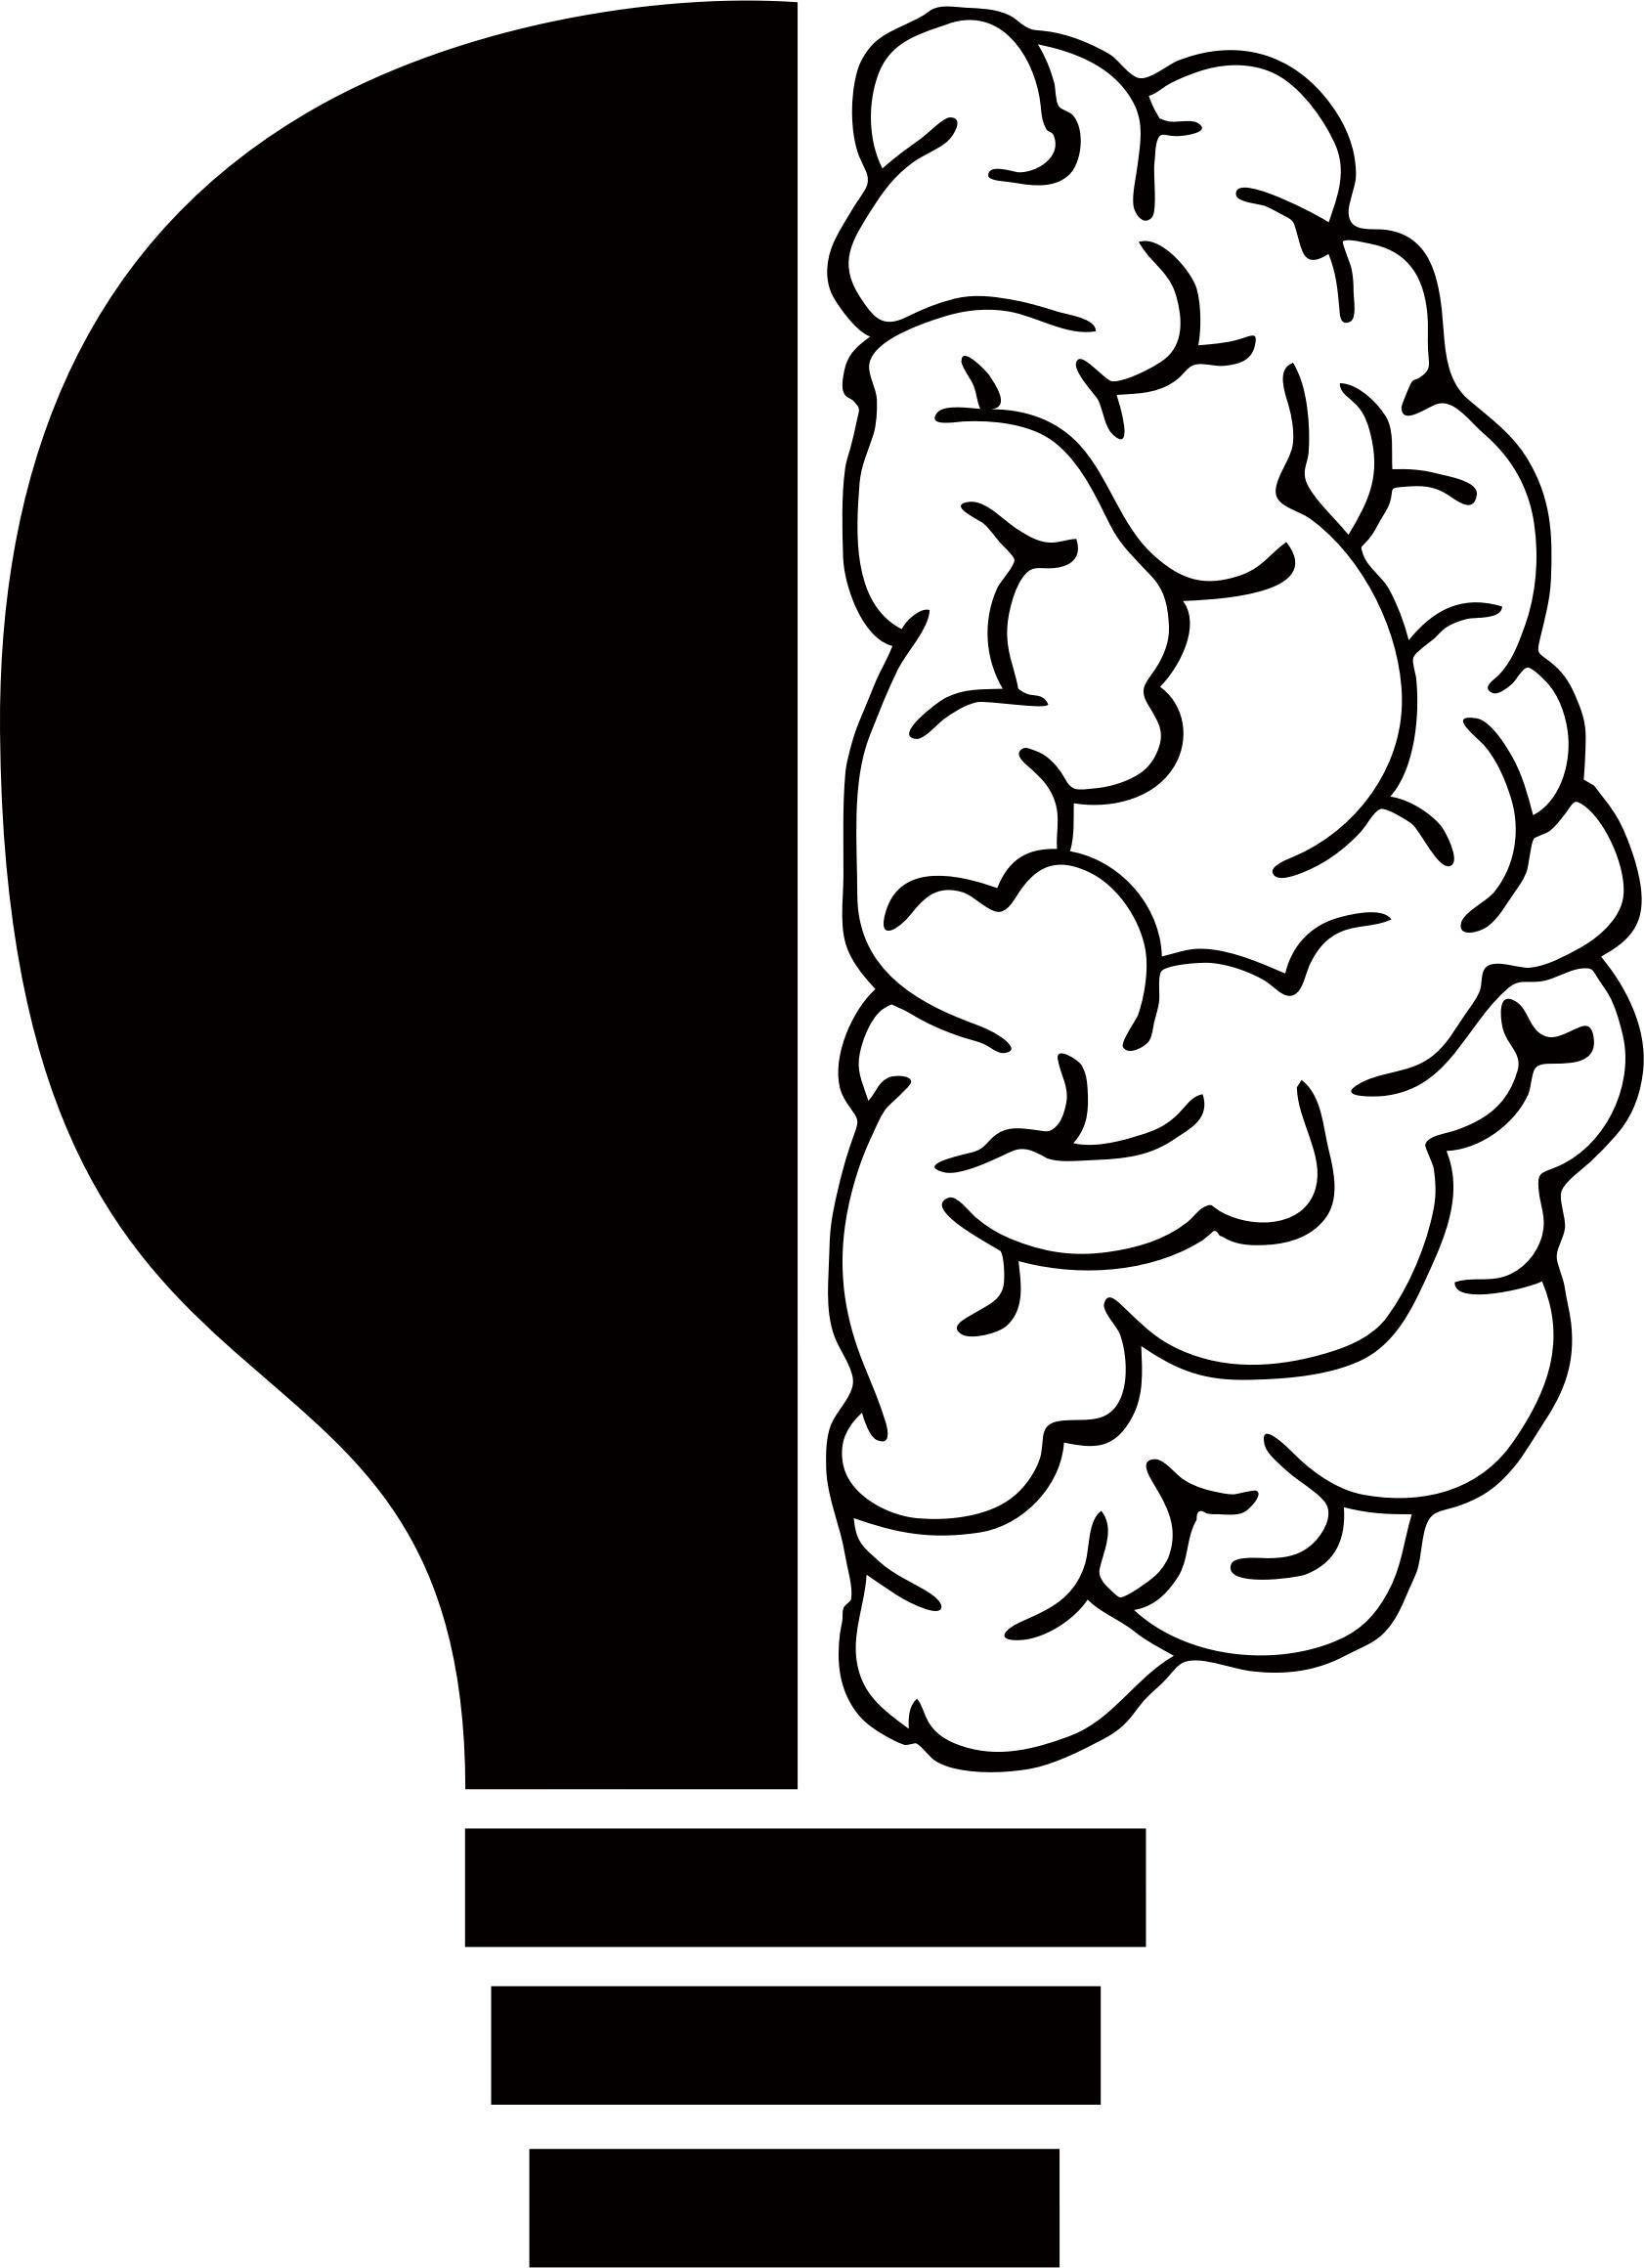 Brain clipart icon. Light bulb by elisa